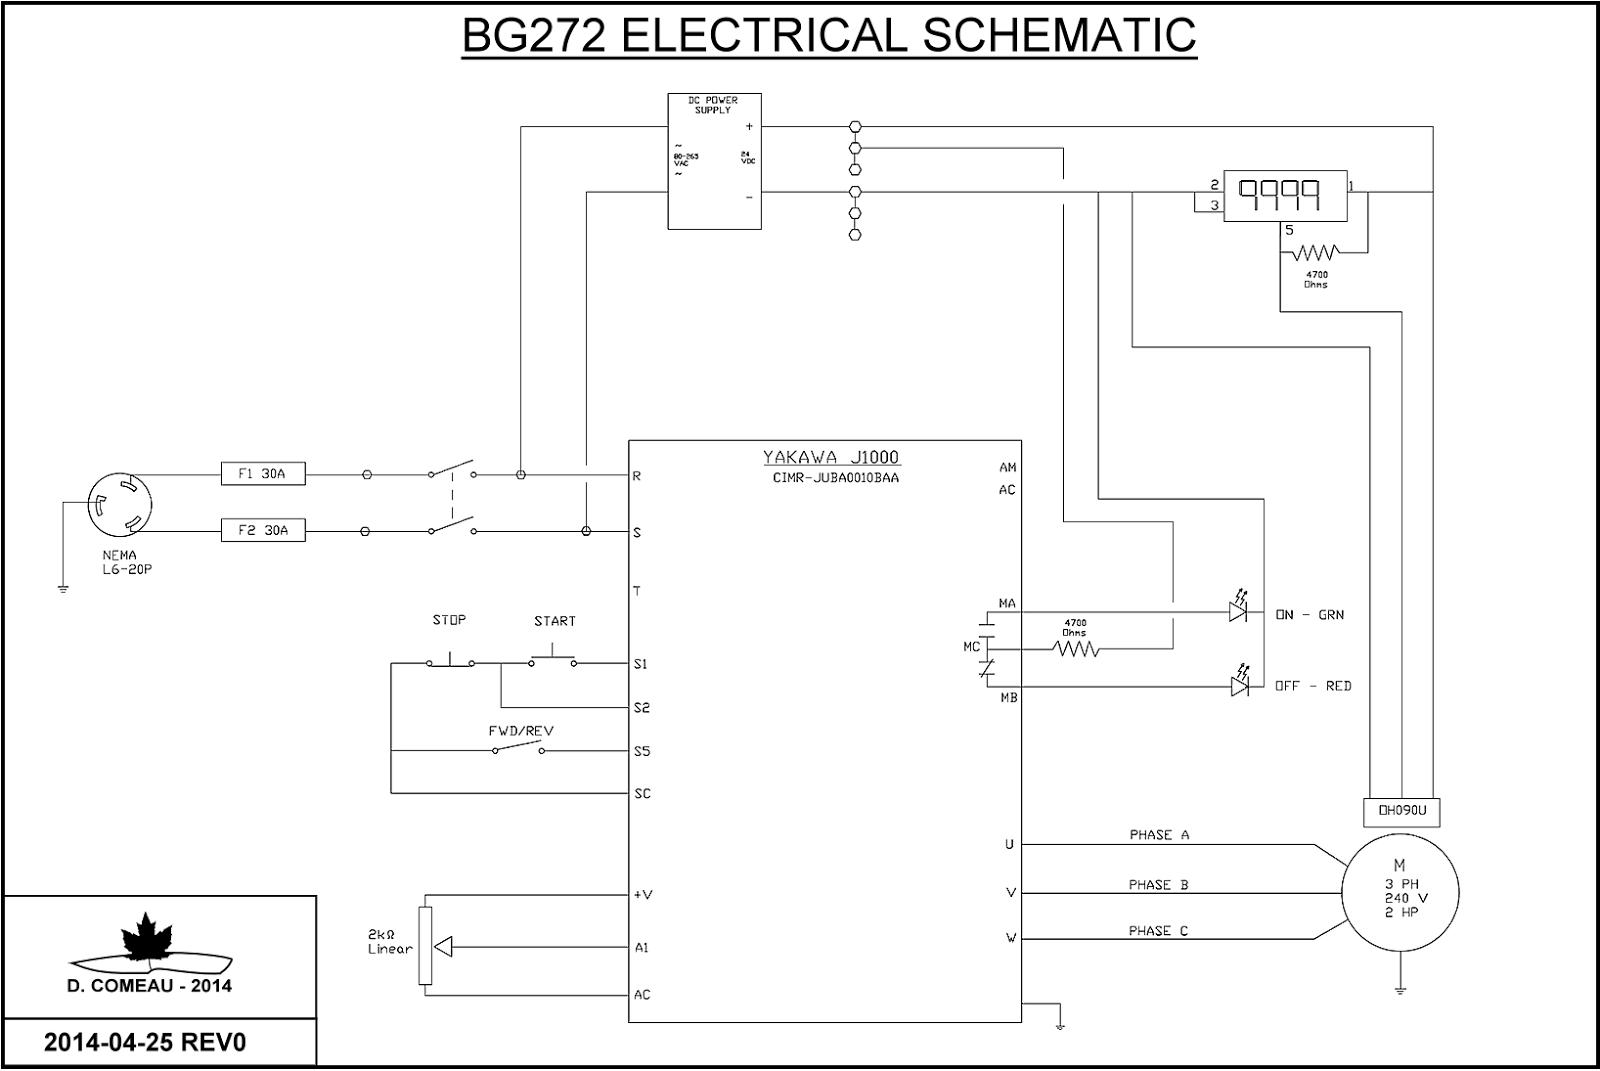 Vfd Panel Wiring Diagram 7 Wire Trailer Troubleshooting Diy Knifemaker 39s Info Center Bg 272 2 X 72 Quot Belt Grinder